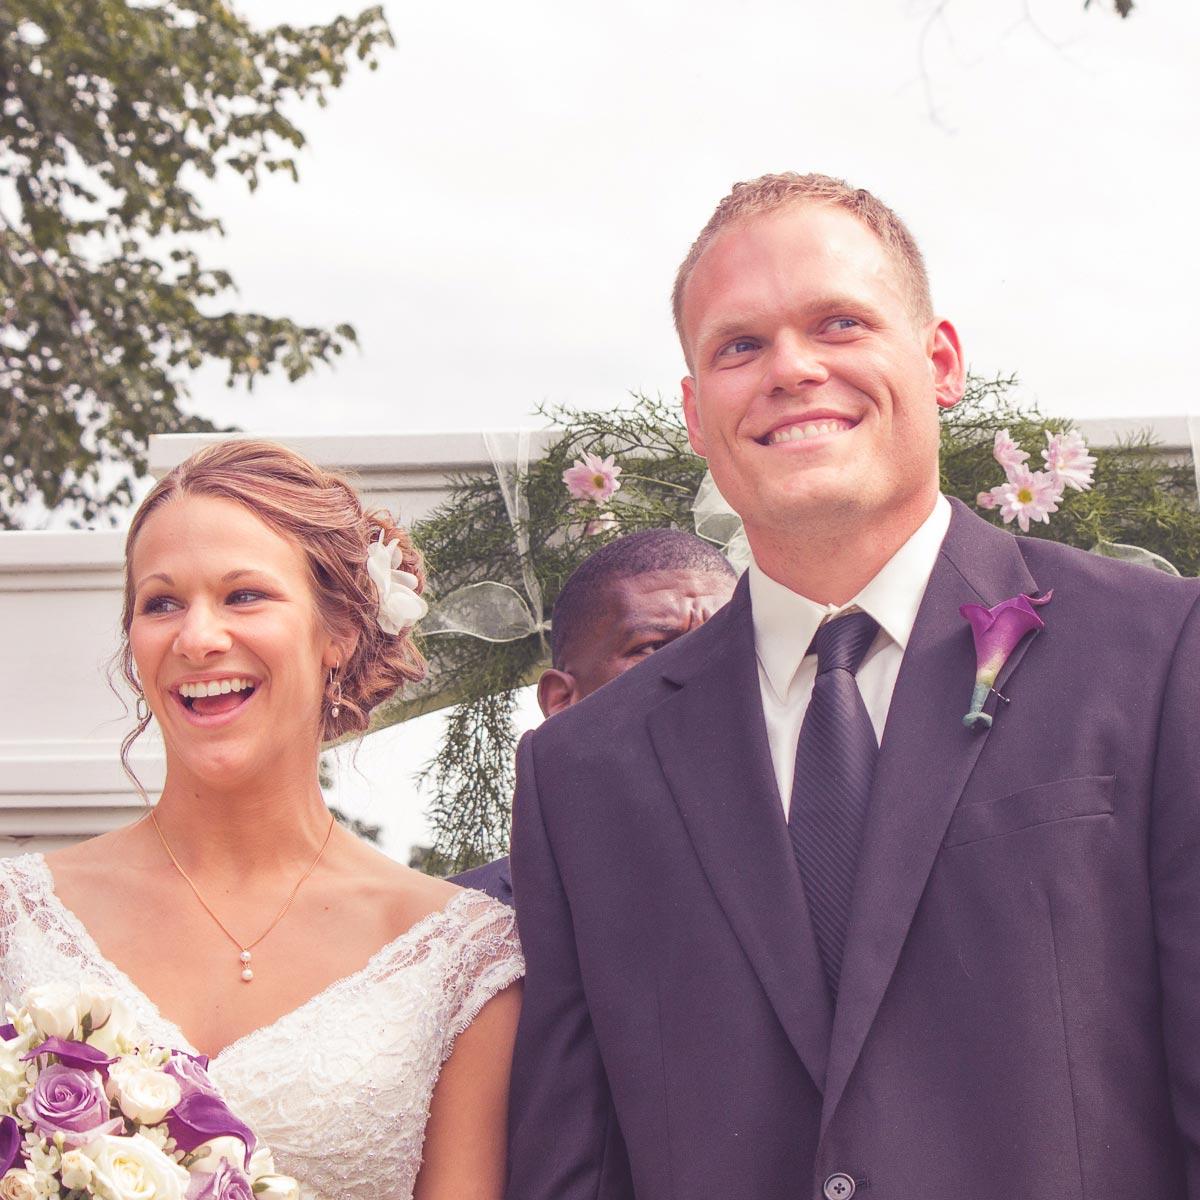 evansville-wedding-photographer-pabst-photo-kokies-echo-valley-(59)